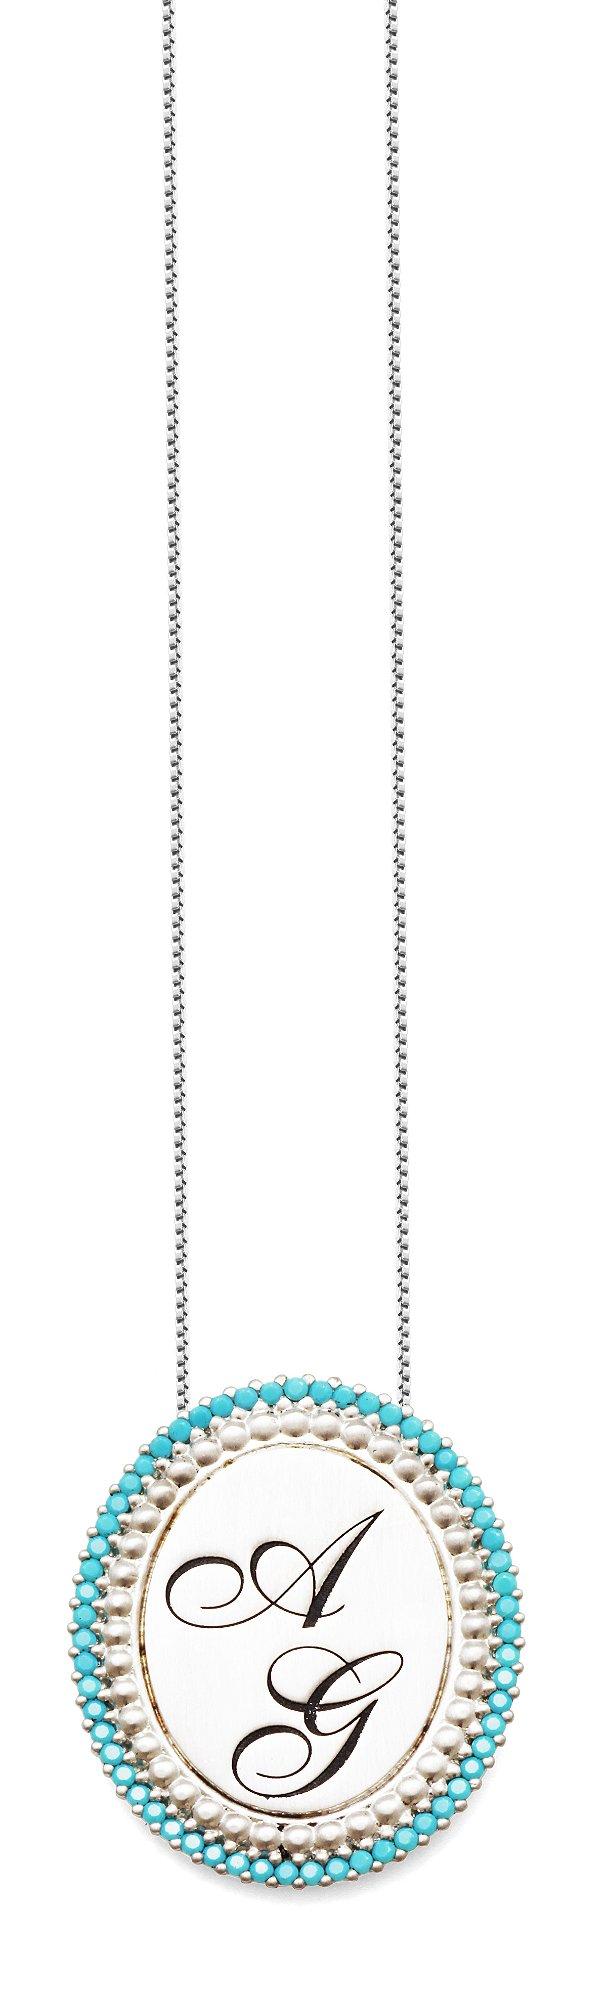 Gargantilha Prata 925 Personalizada até 3 Letras Borda Turquesa Redonda VD 195